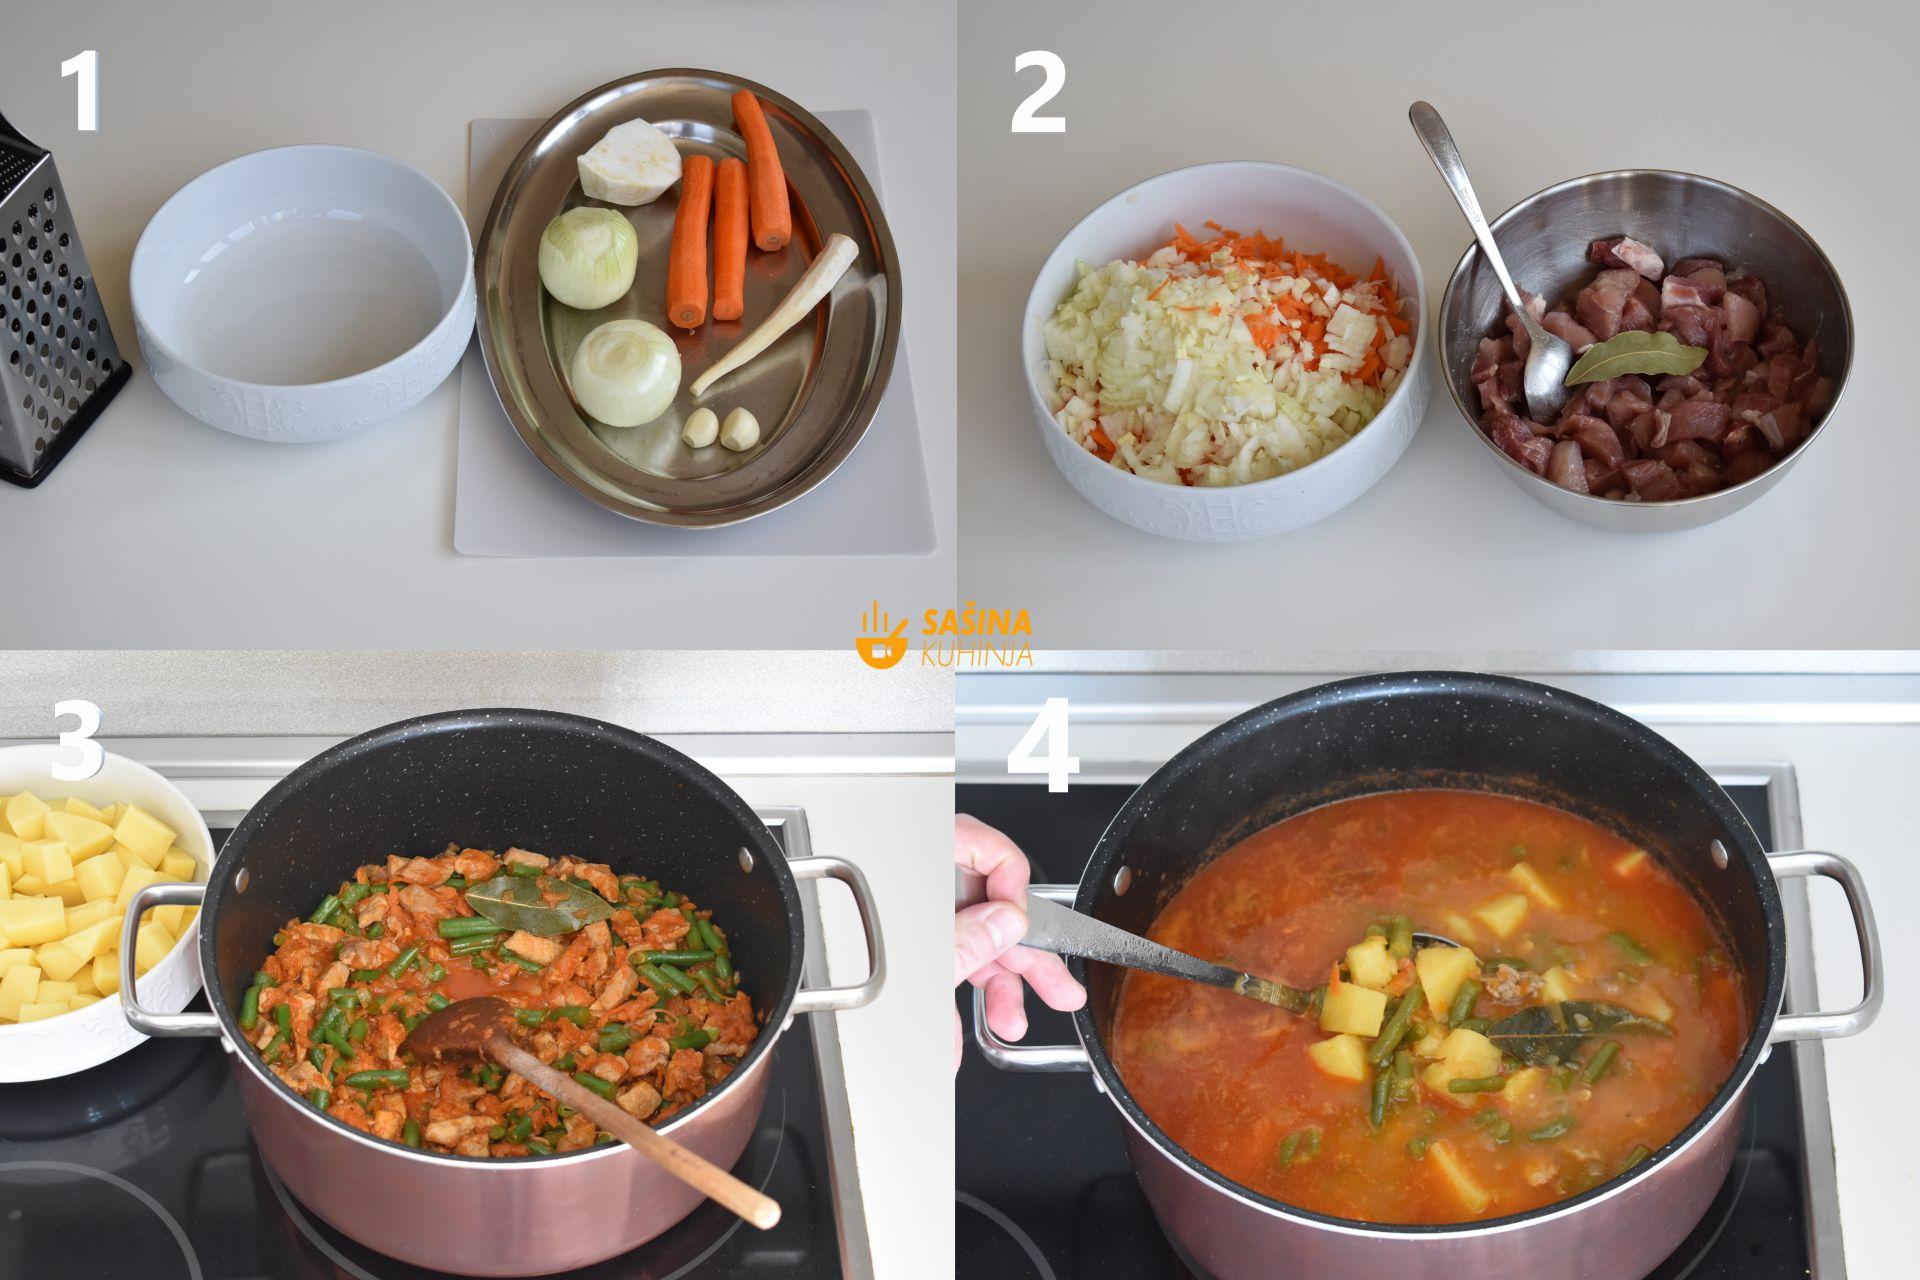 zelene mahune sa svinjetinom i krumpirom varivo recept